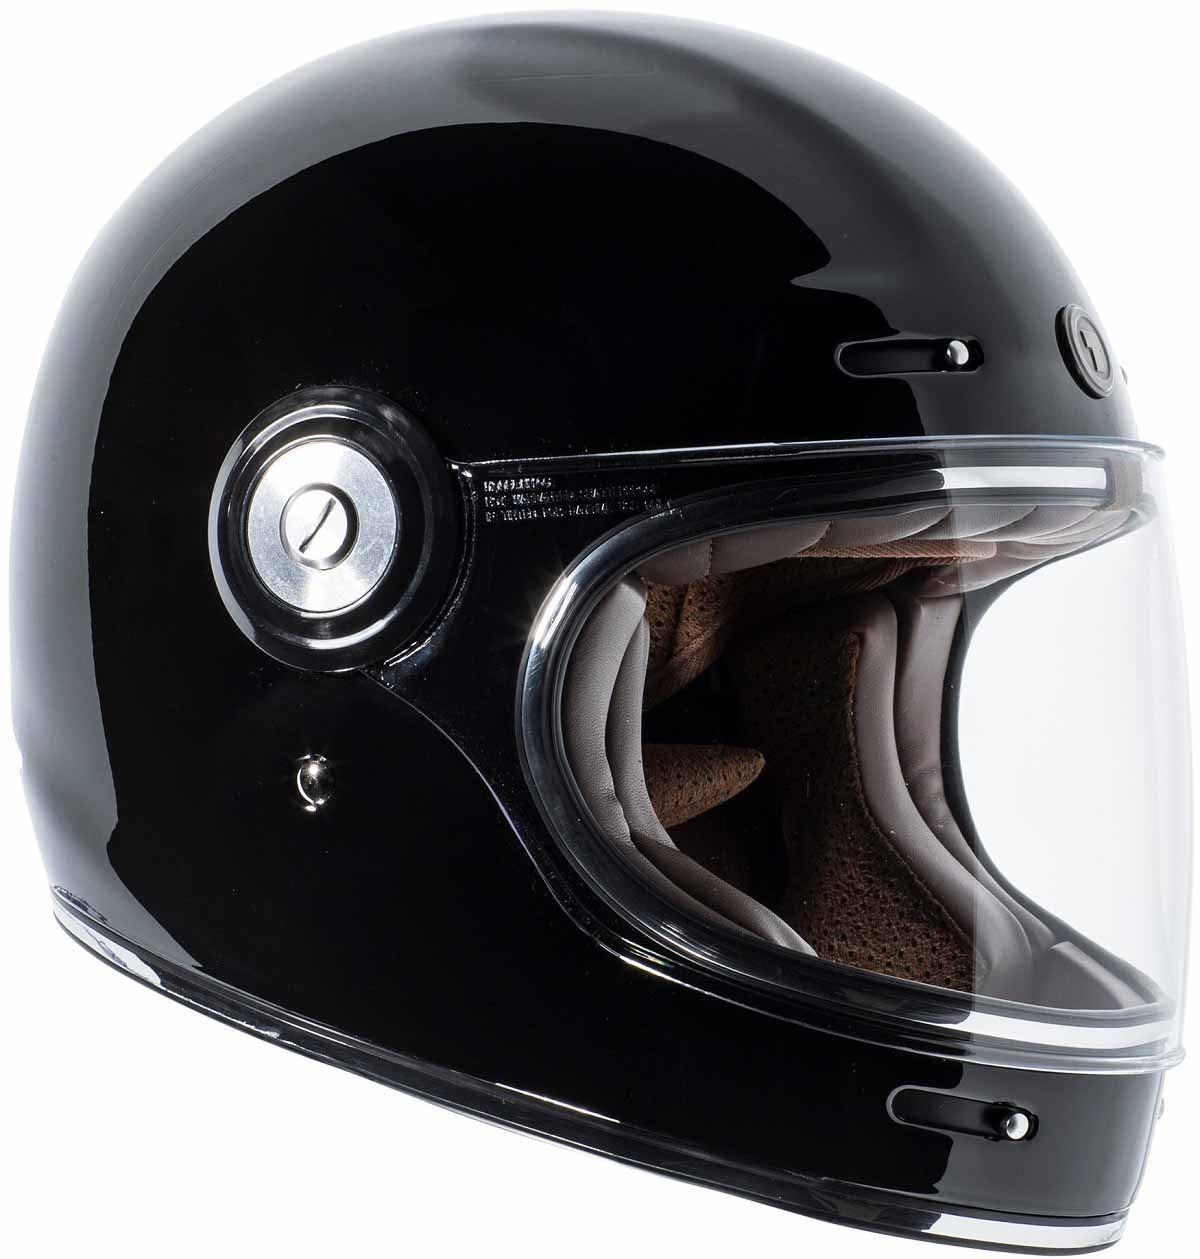 miniature 8 - Torc T1 Helmet Retro Vintage Style Fiberglass DOT Approved XS-2XL